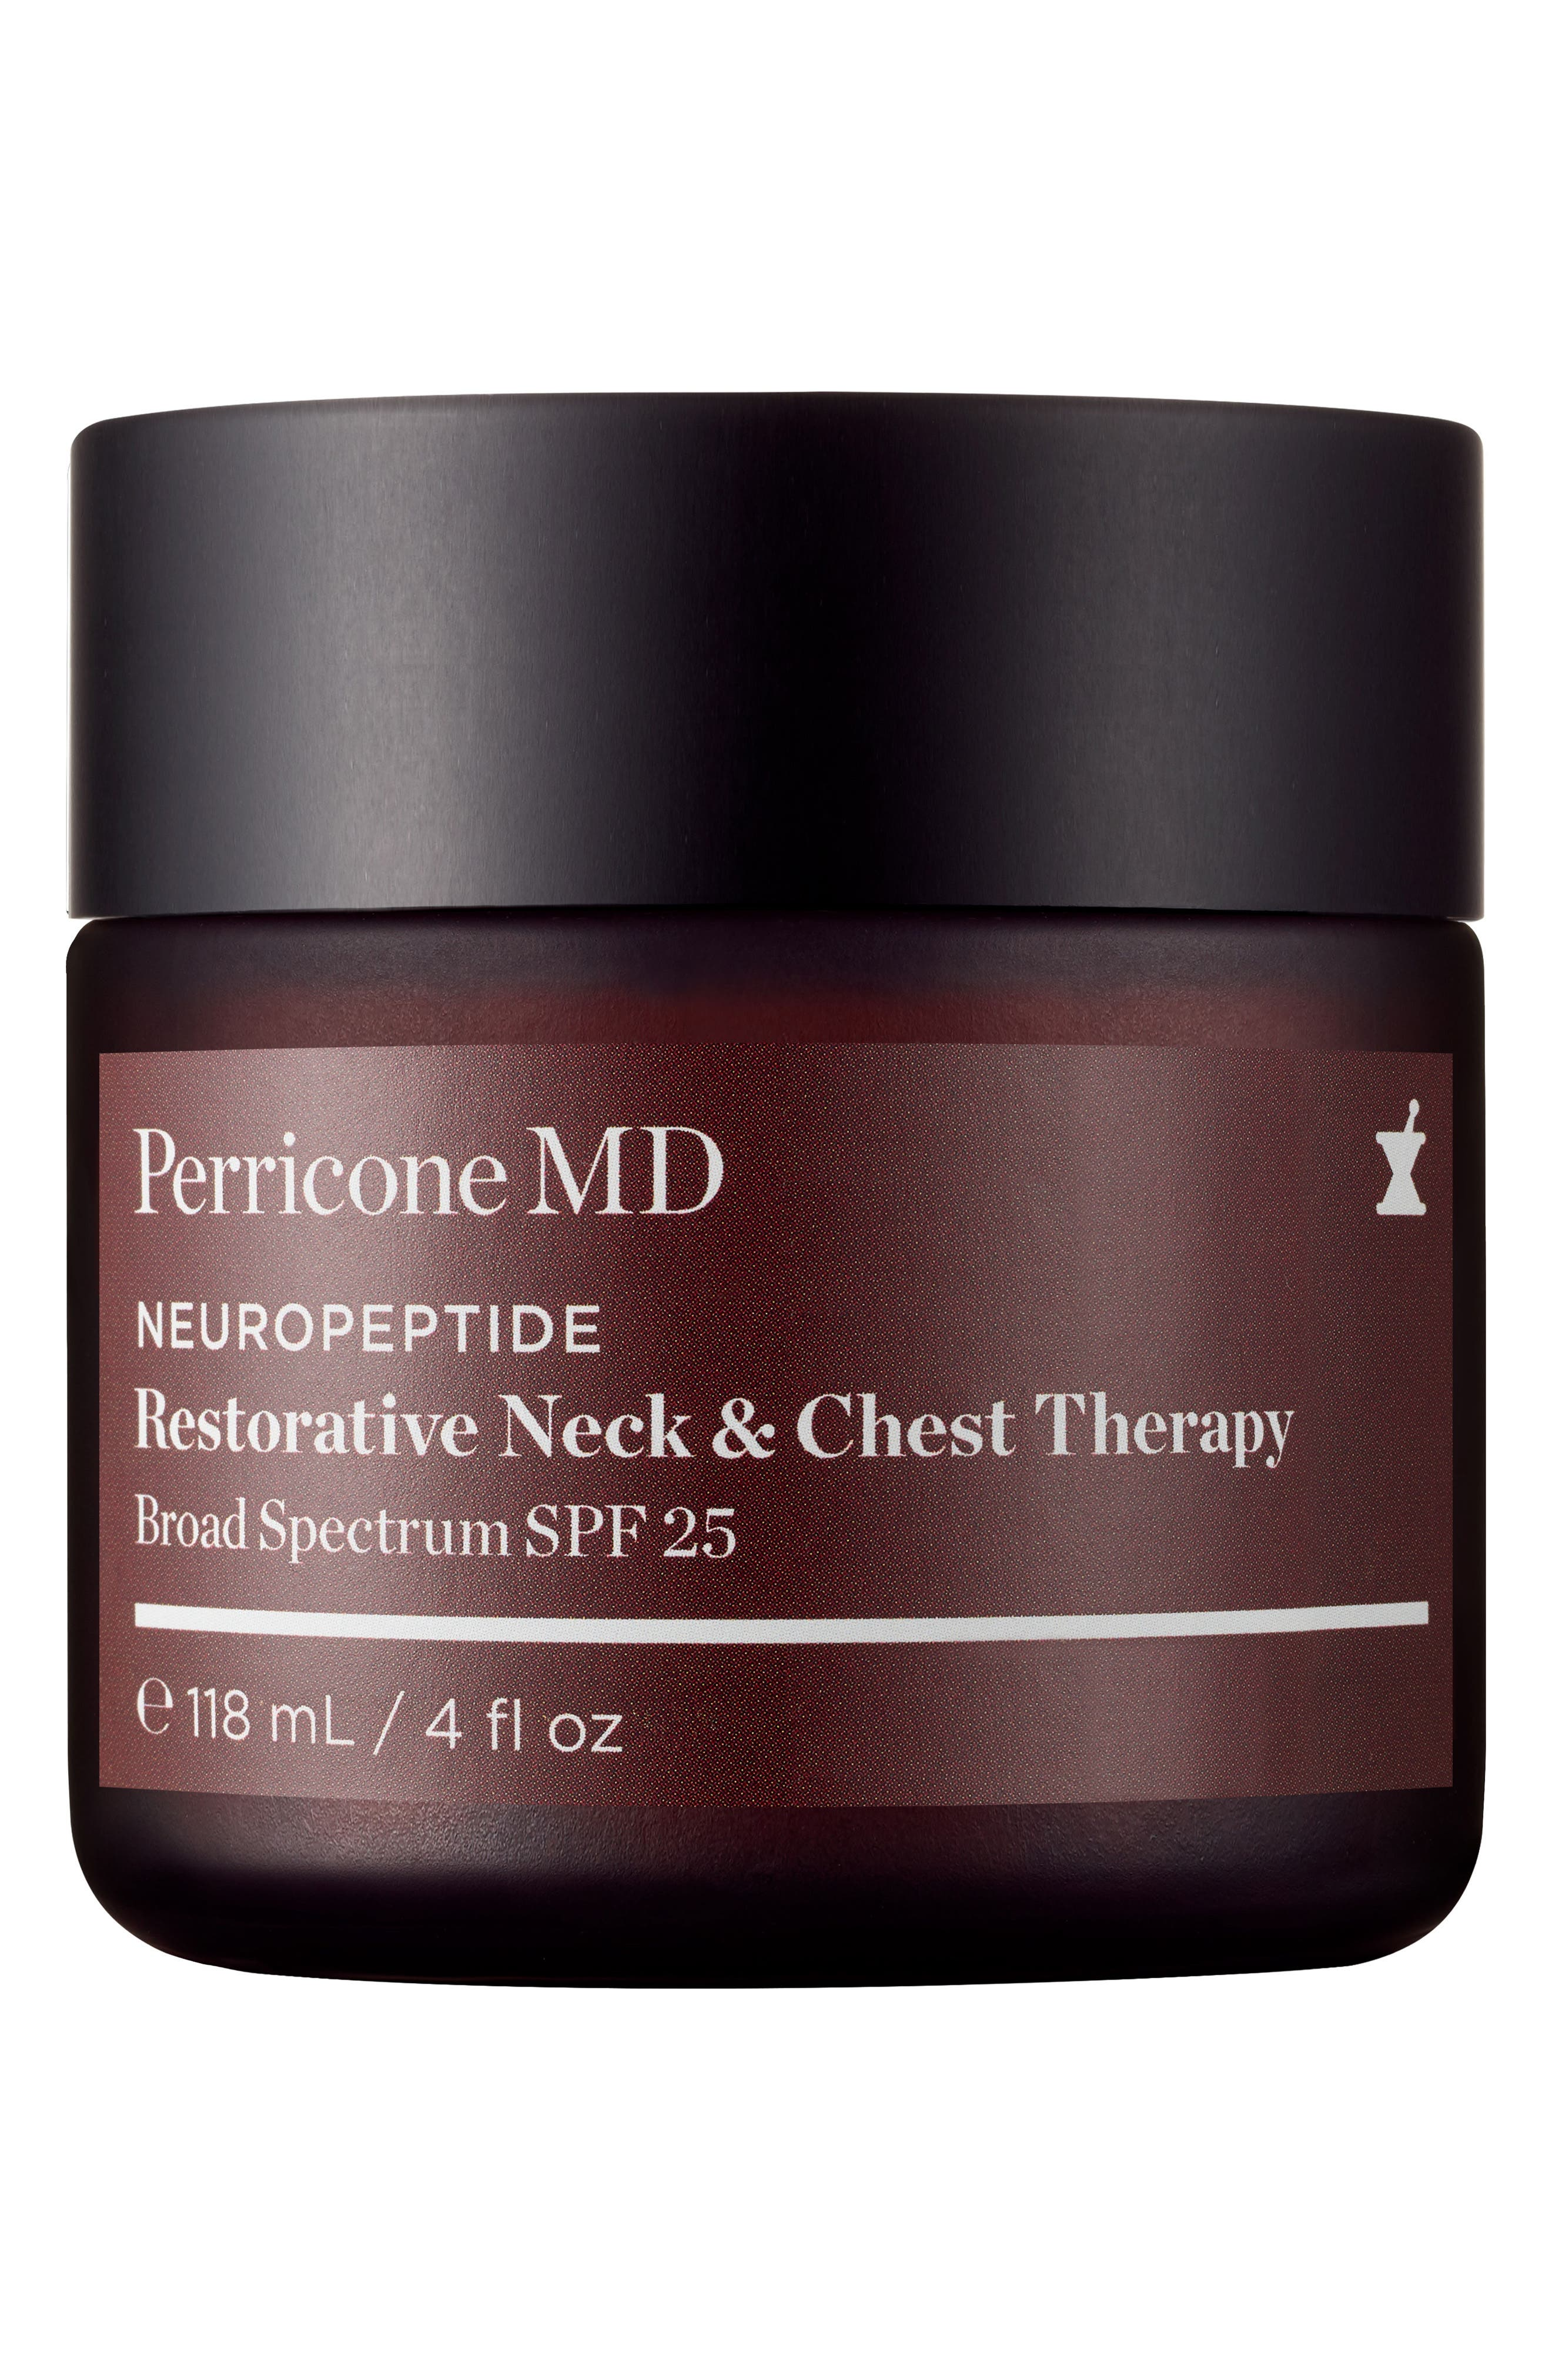 Neuropeptide Restorative Neck & Chest Therapy SPF 25,                             Main thumbnail 1, color,                             No Color